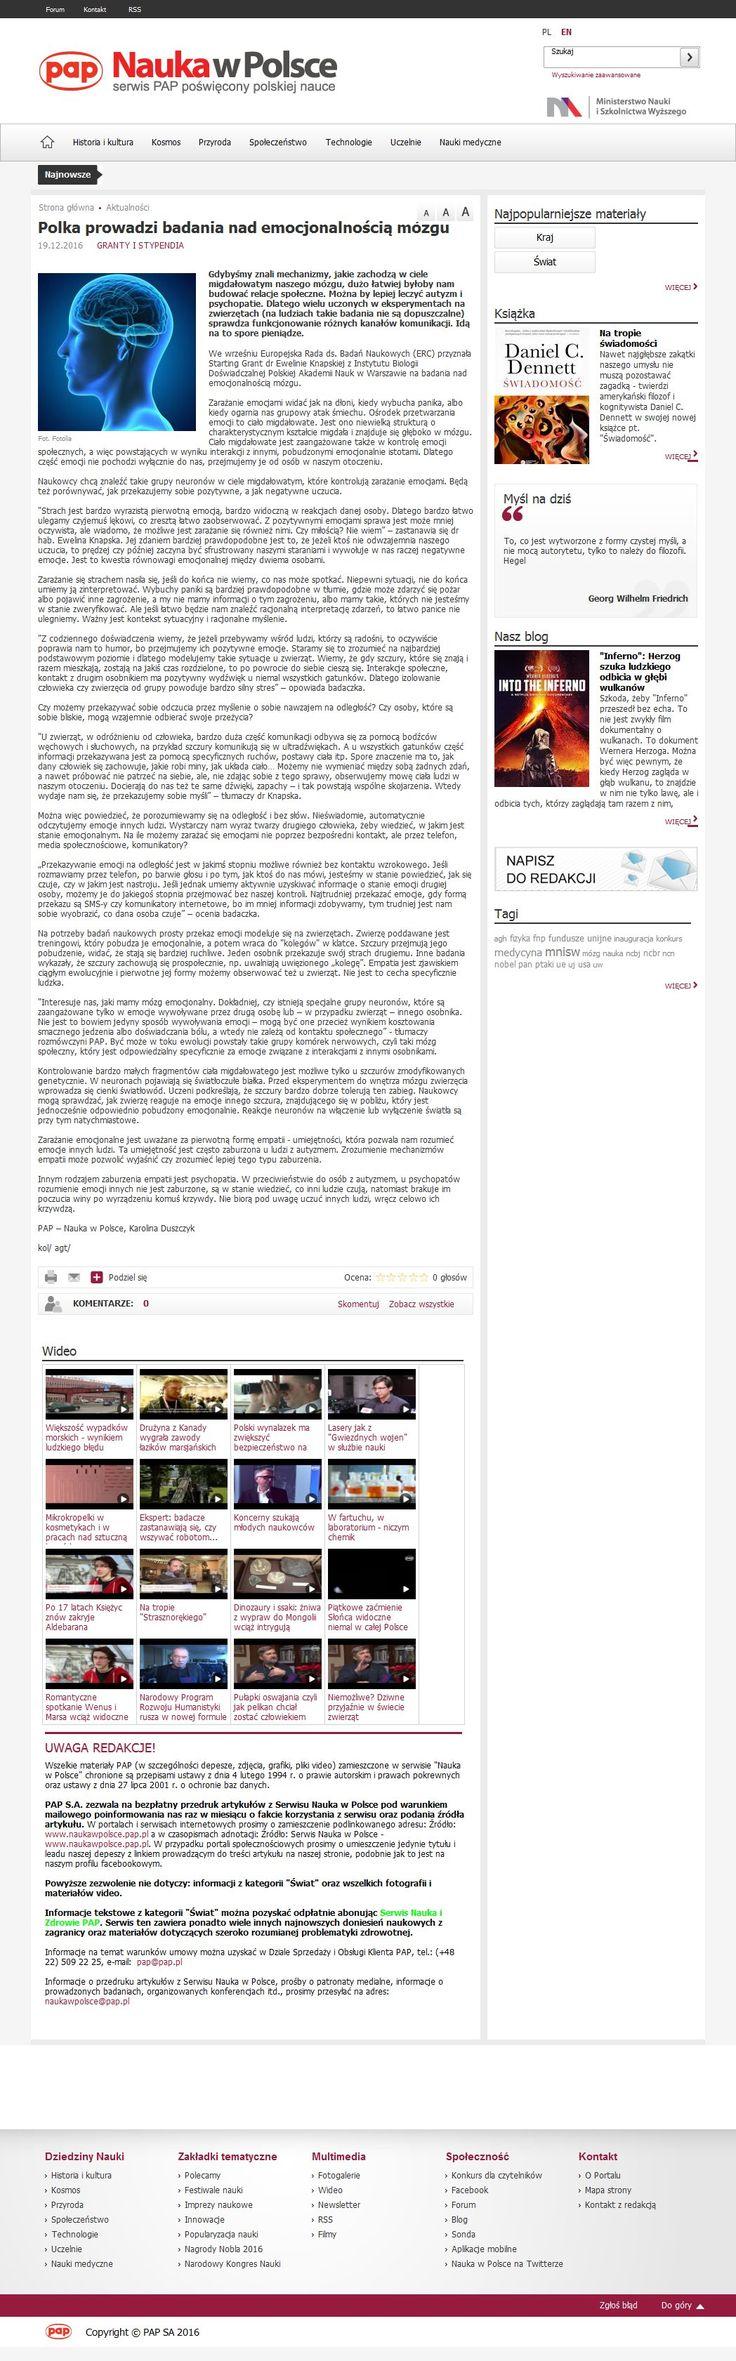 http://nencki.inforia.net/przeglad.aspx?mode=podglad